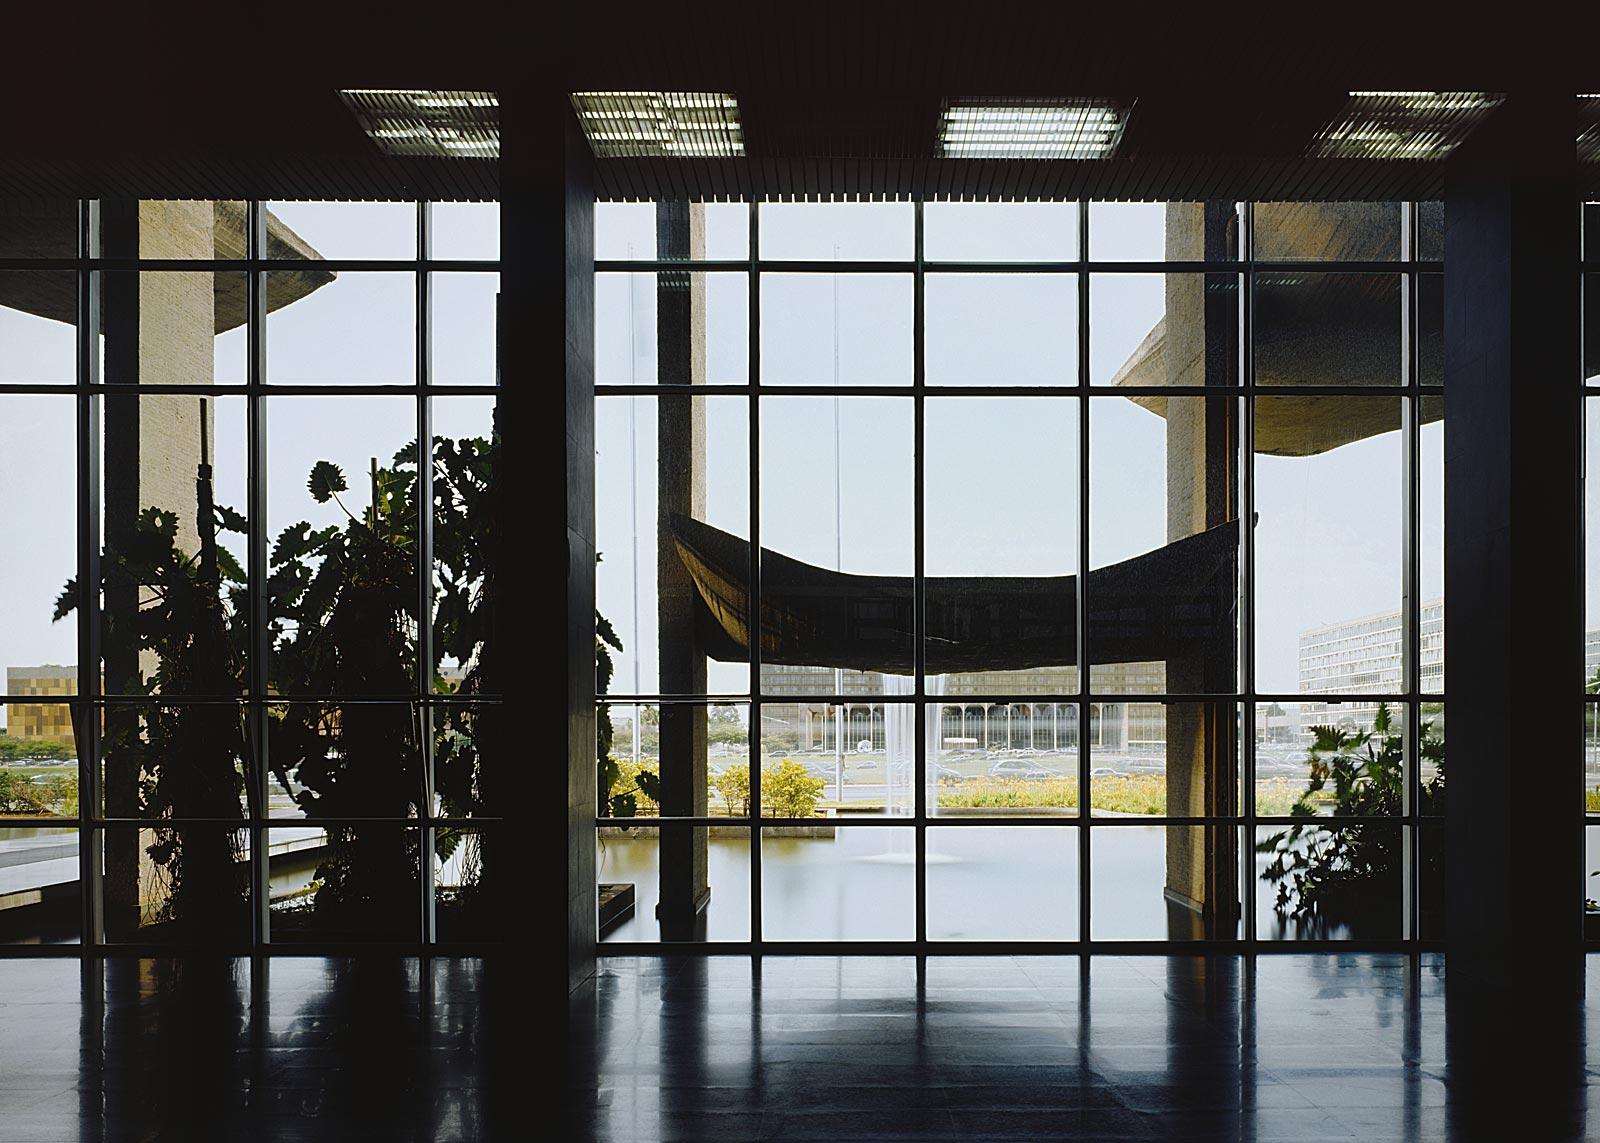 Palácio da Justiça, Brasilia